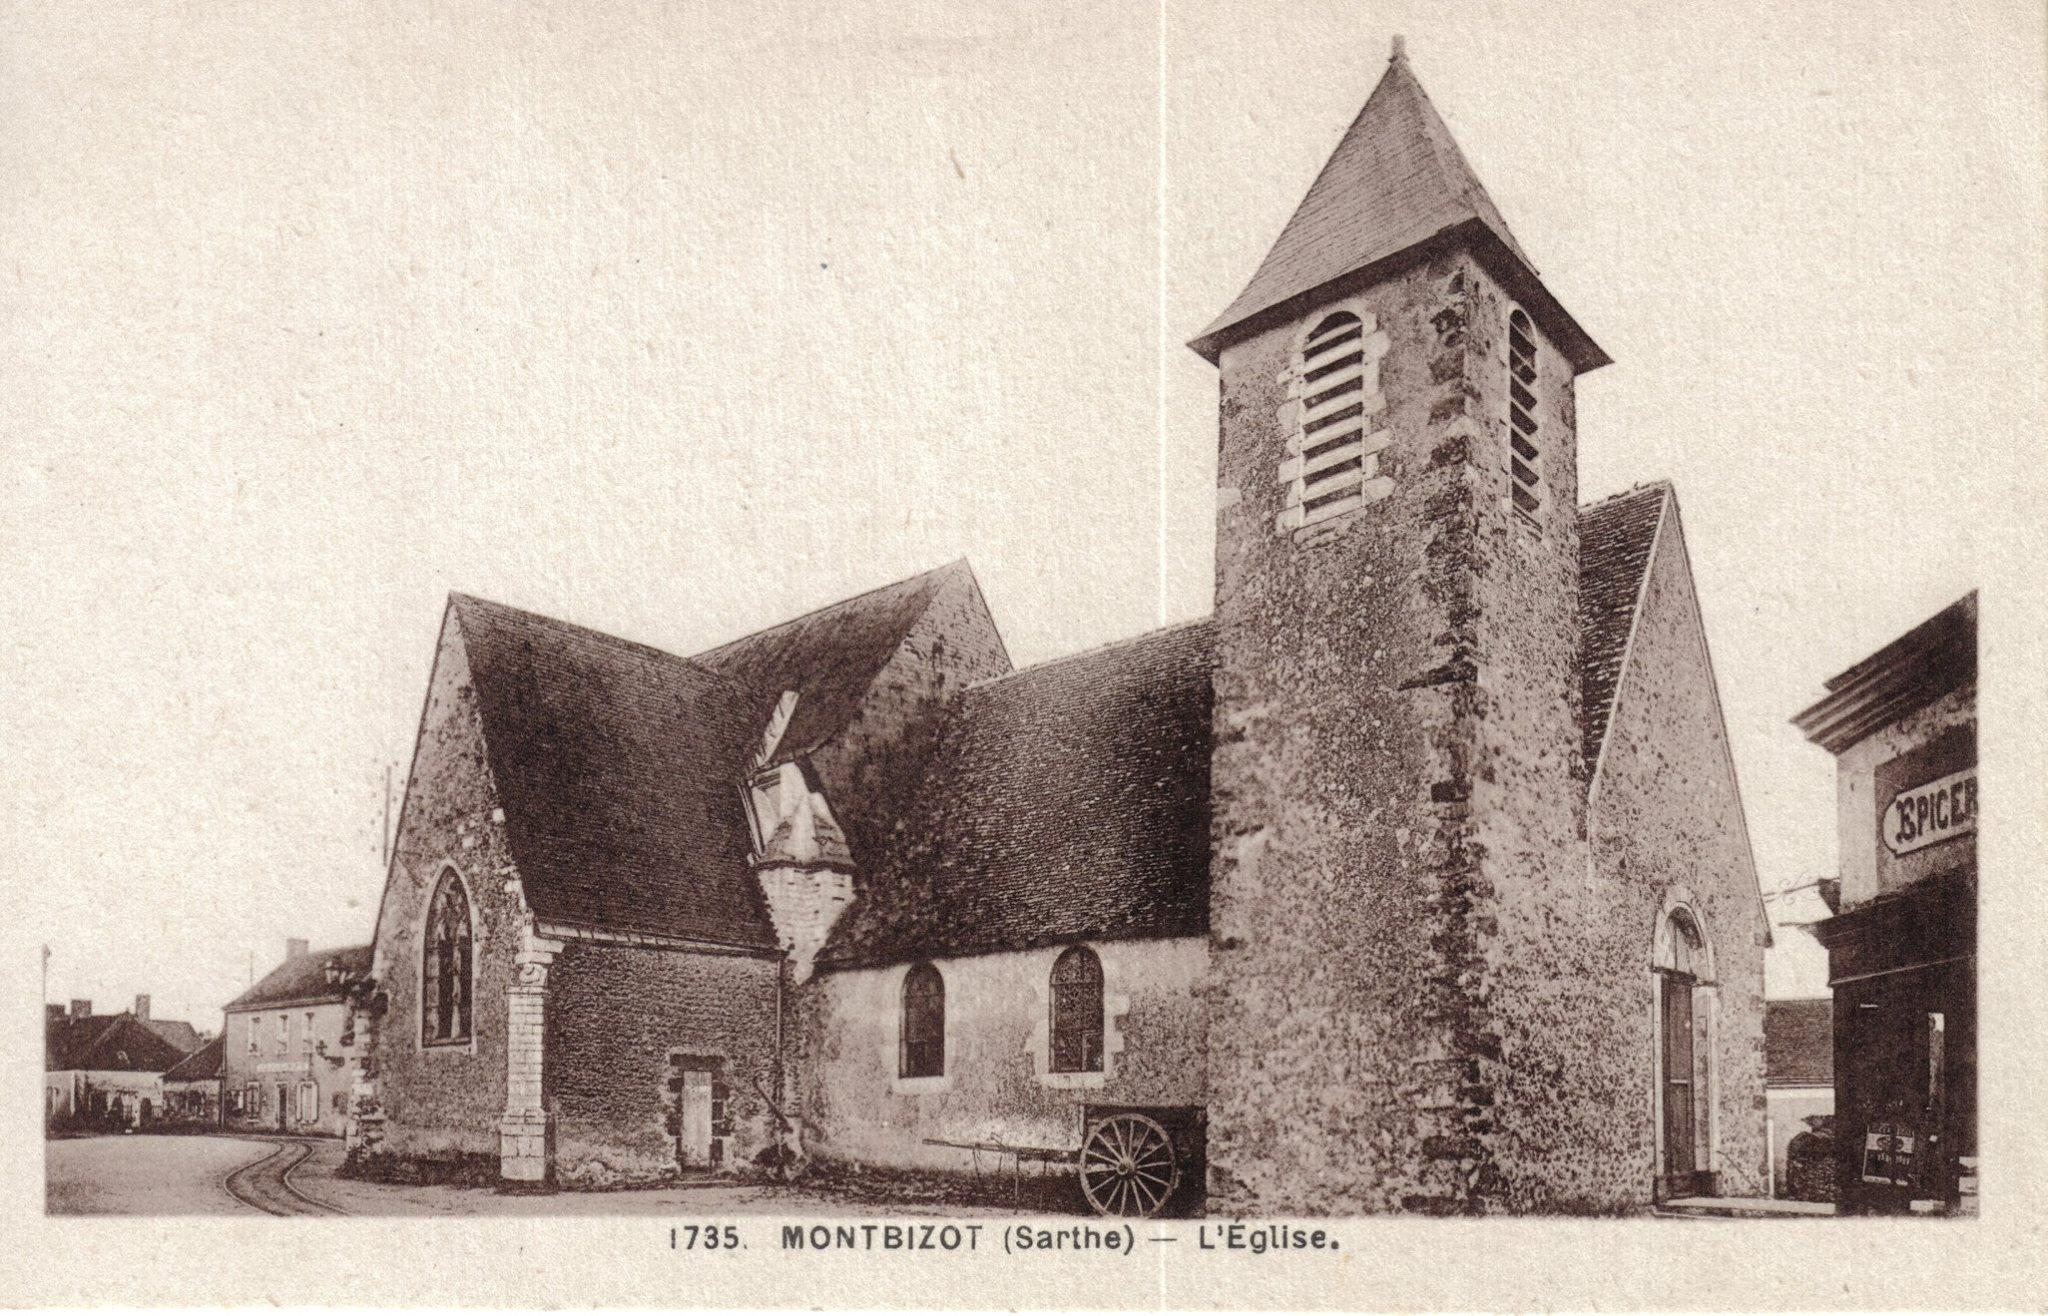 Montbizot - L'Eglise